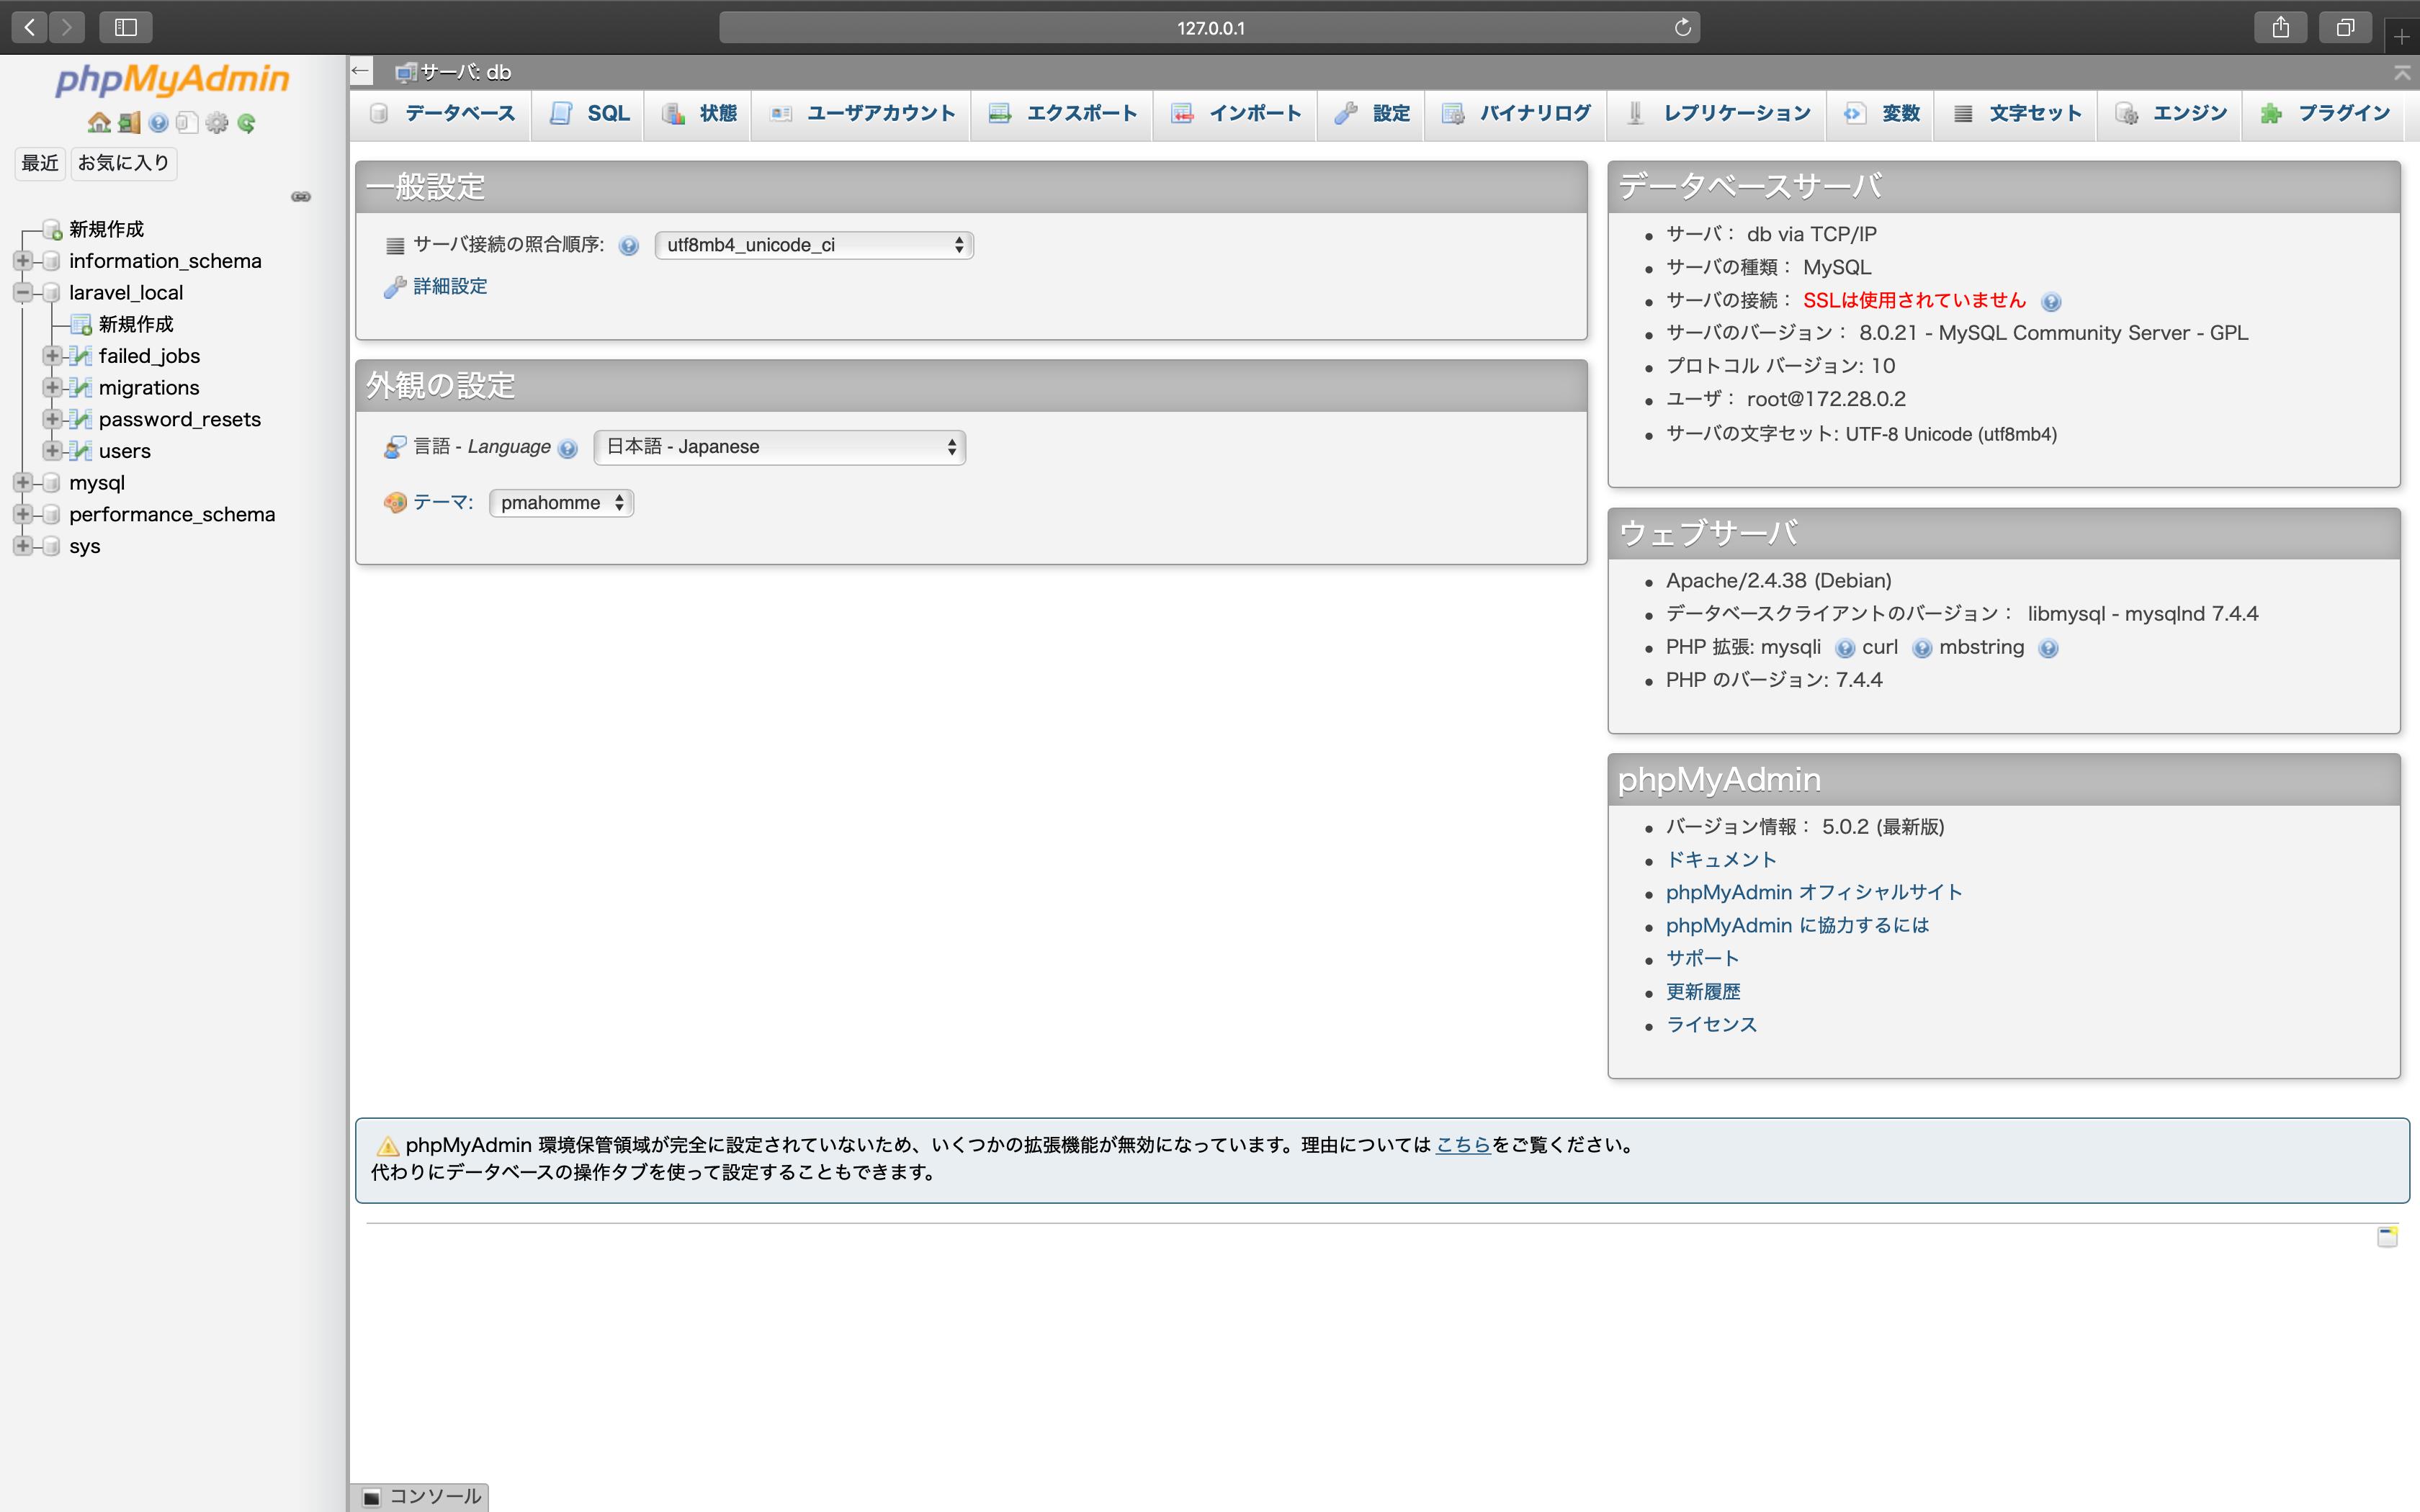 ScreenShot 2020-09-22 19.11.42.png